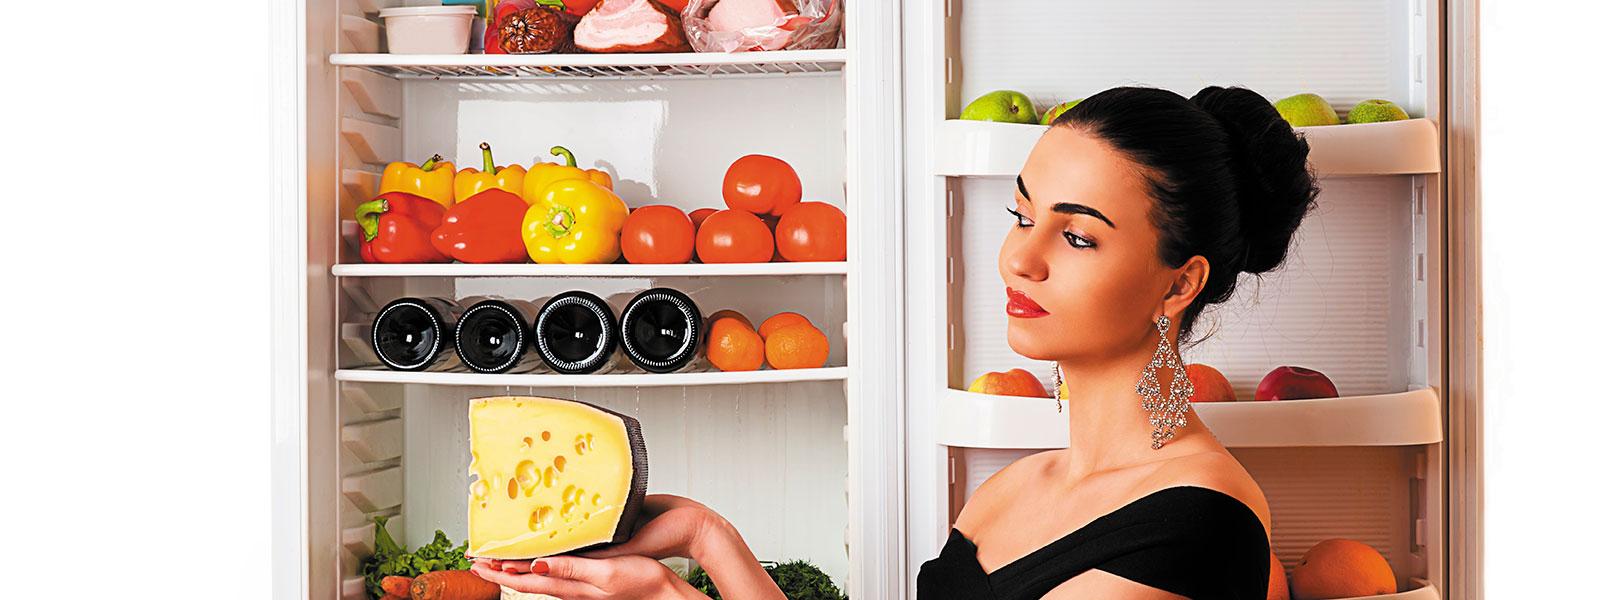 Eine Frau lagert Käse im Kühlschrank